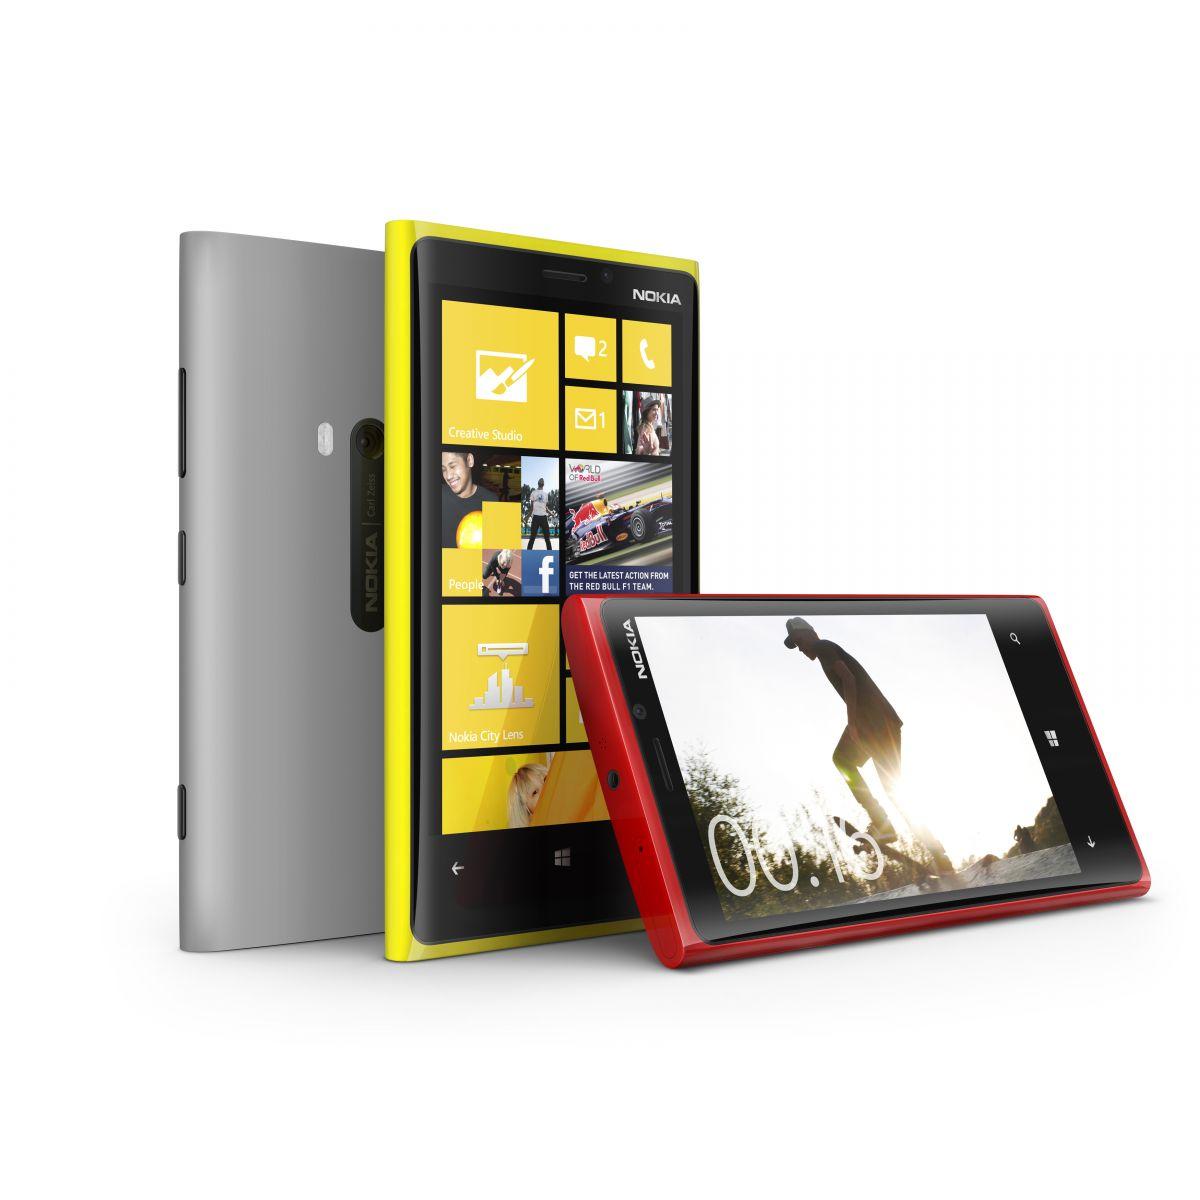 daftar harga nokia lumia1 Daftar Harga Nokia Lumia Juli 2013